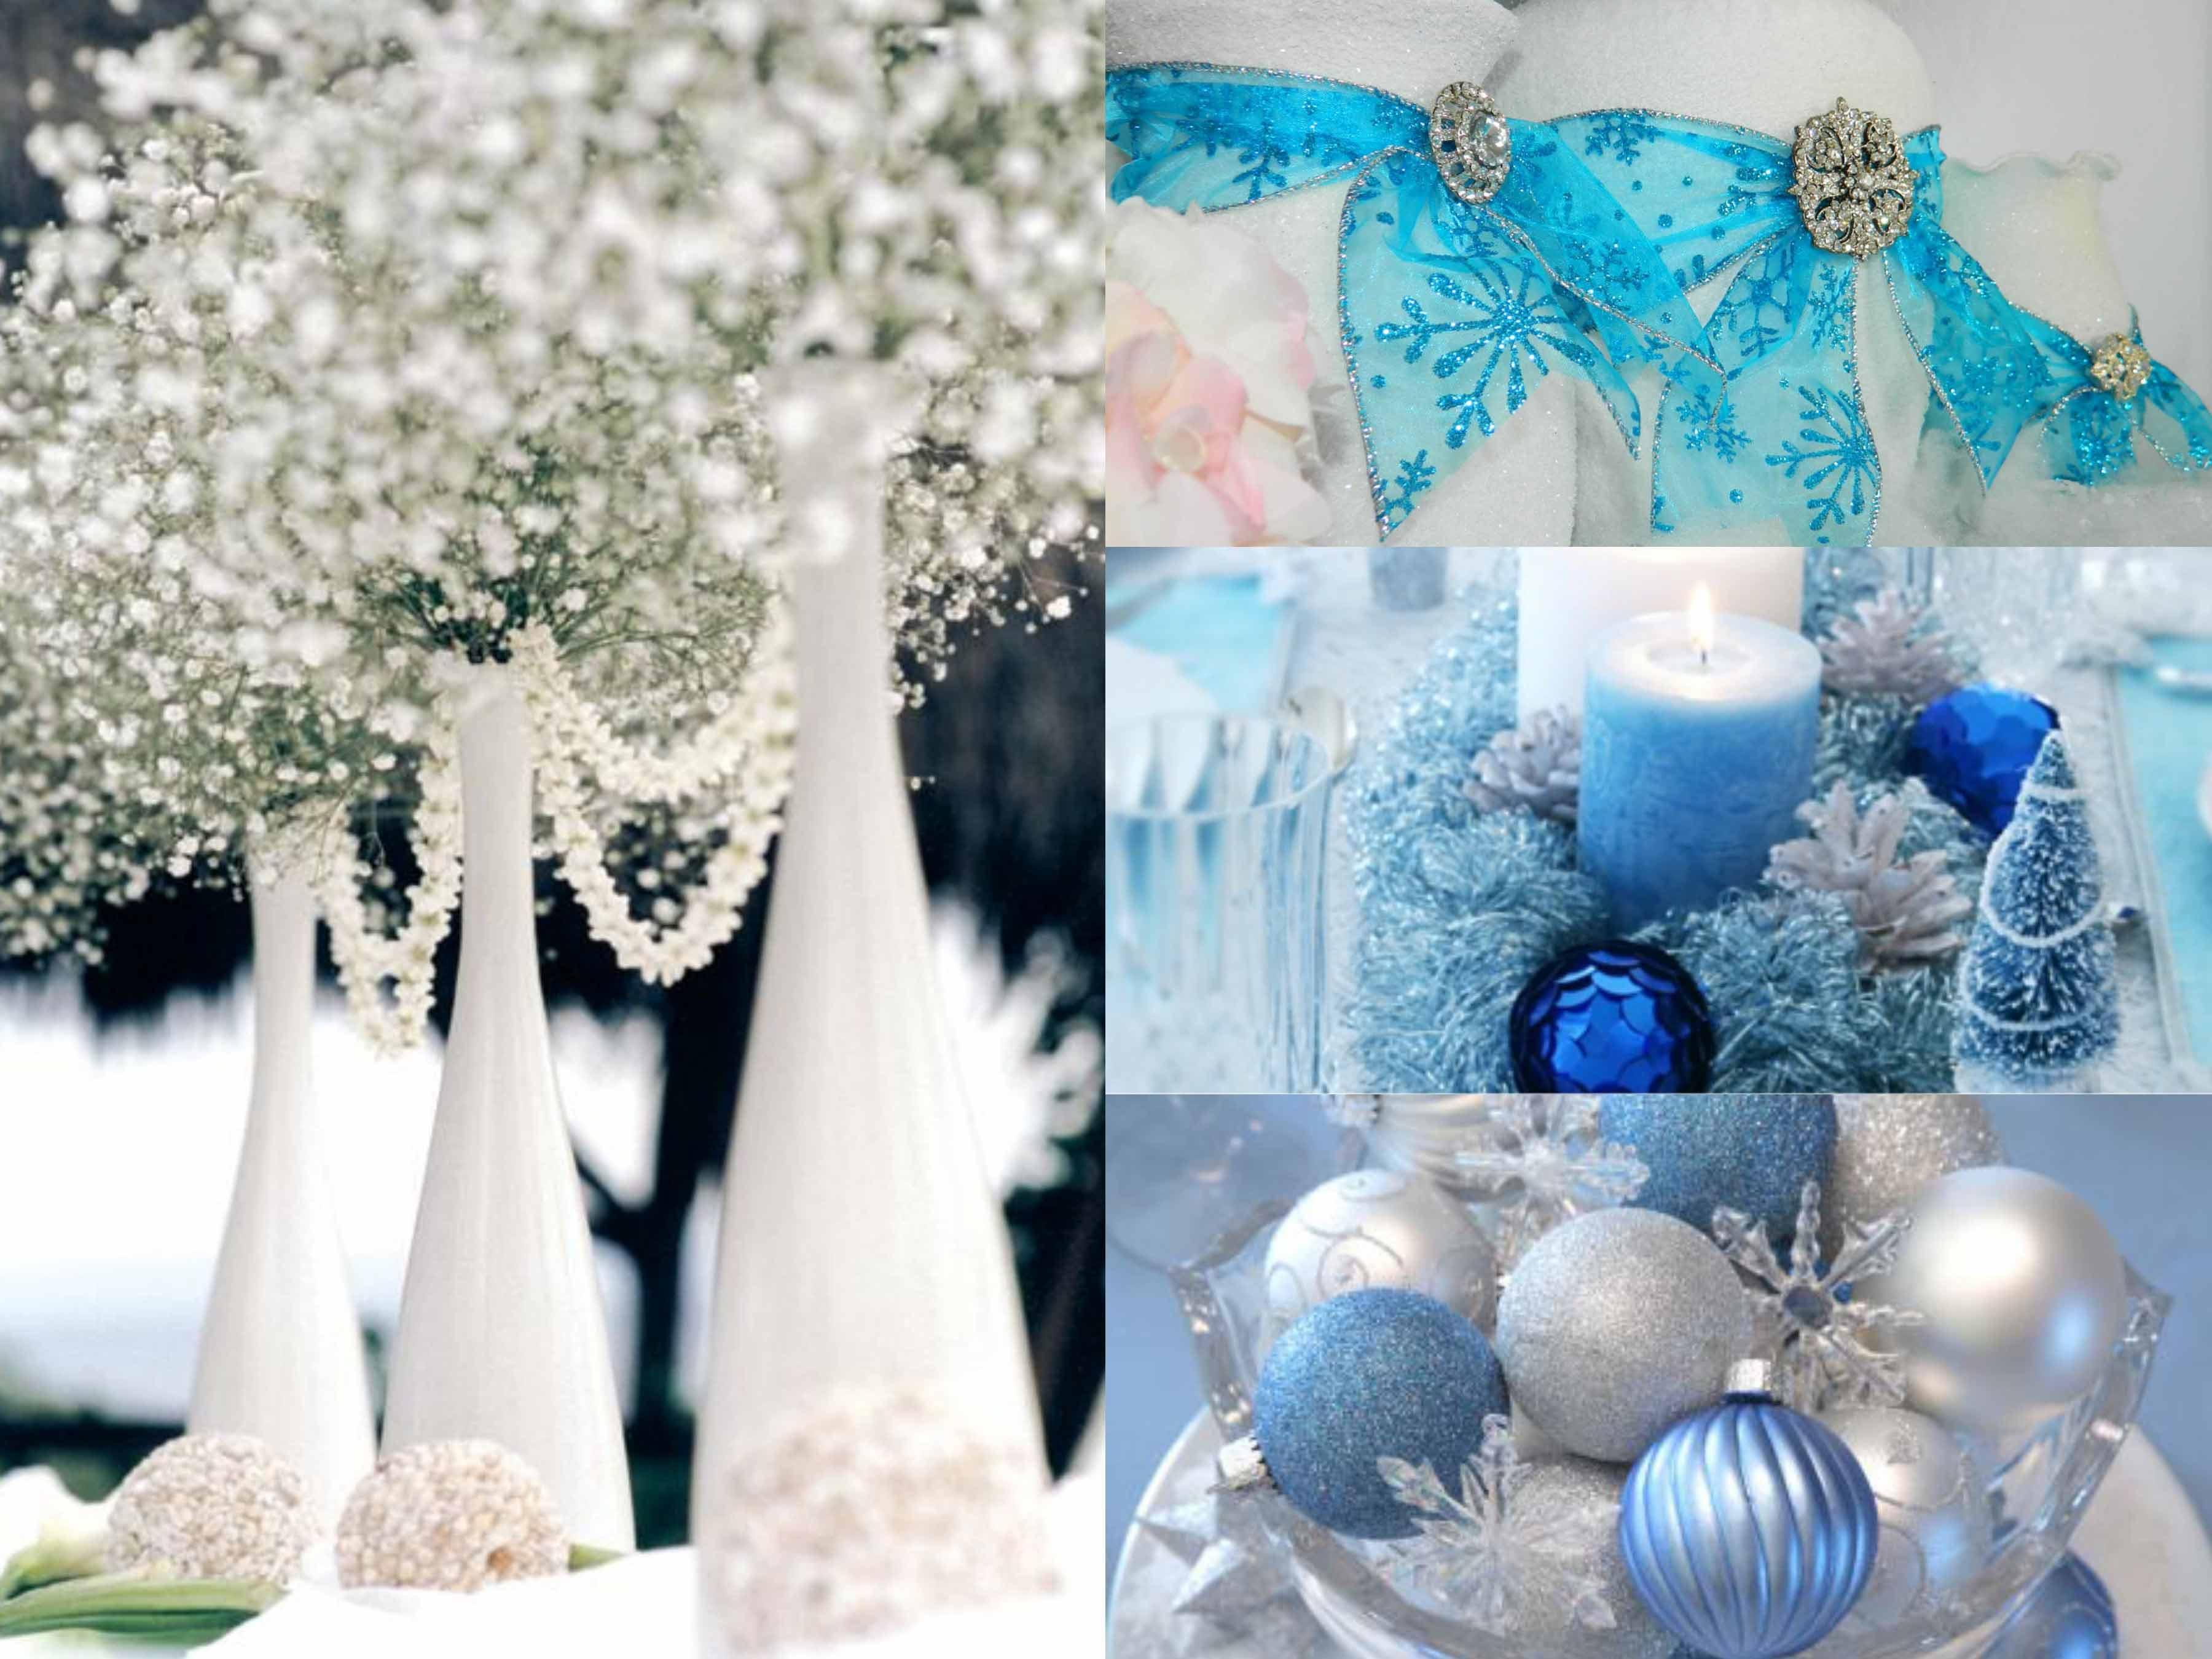 Winter Home Decor Ideas-interior-design-view-winter-themed-table-decorations-home-design